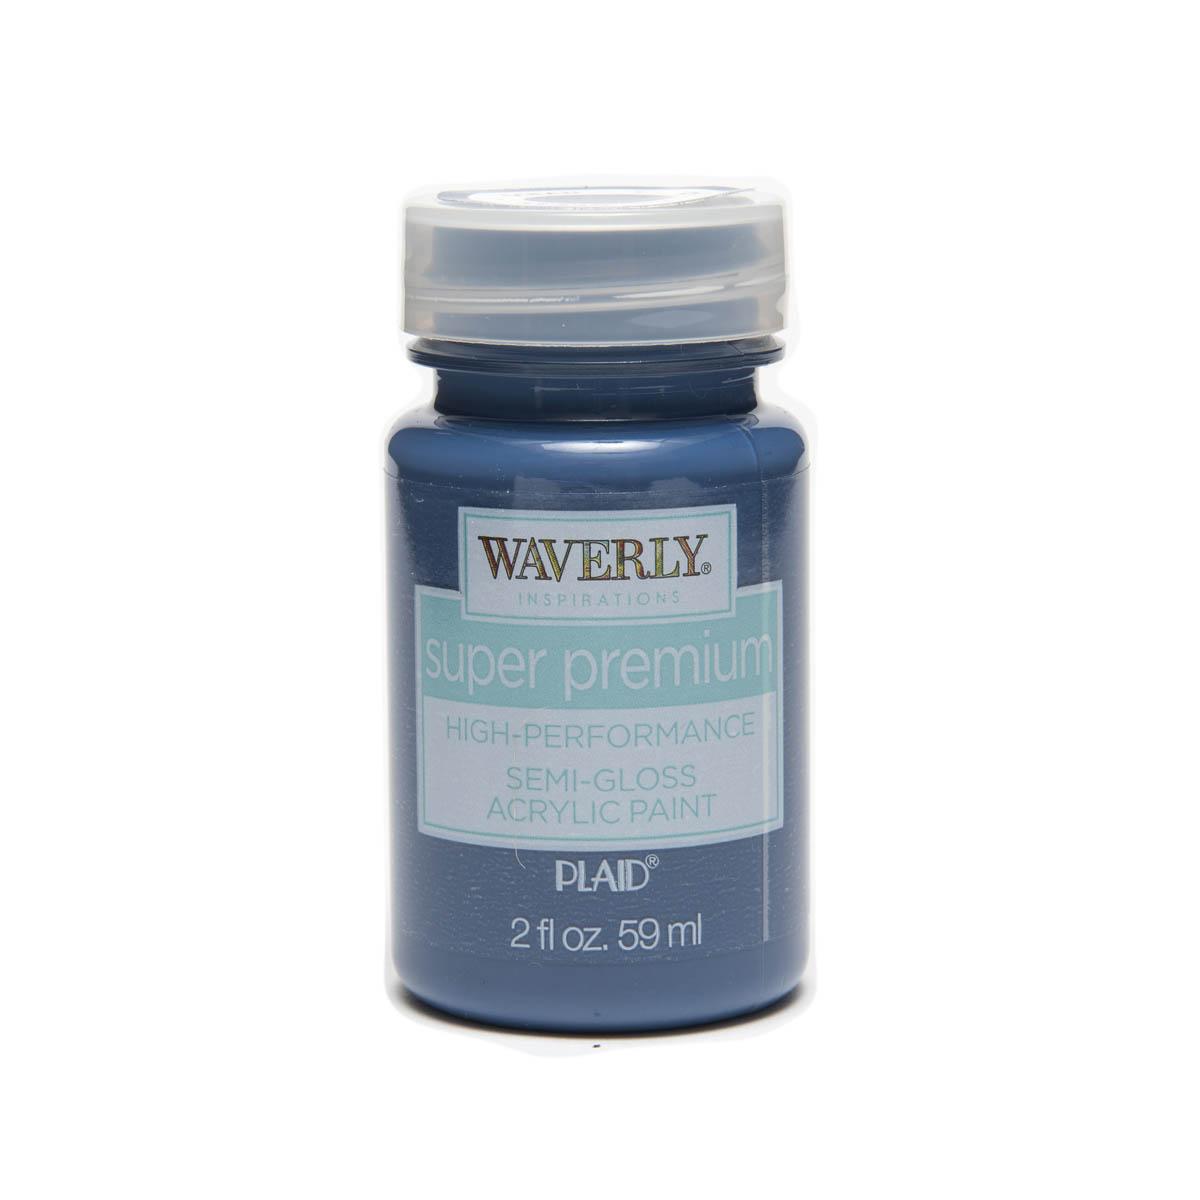 Waverly ® Inspirations Super Premium Semi-Gloss Acrylic Paint - Ocean, 2 oz.